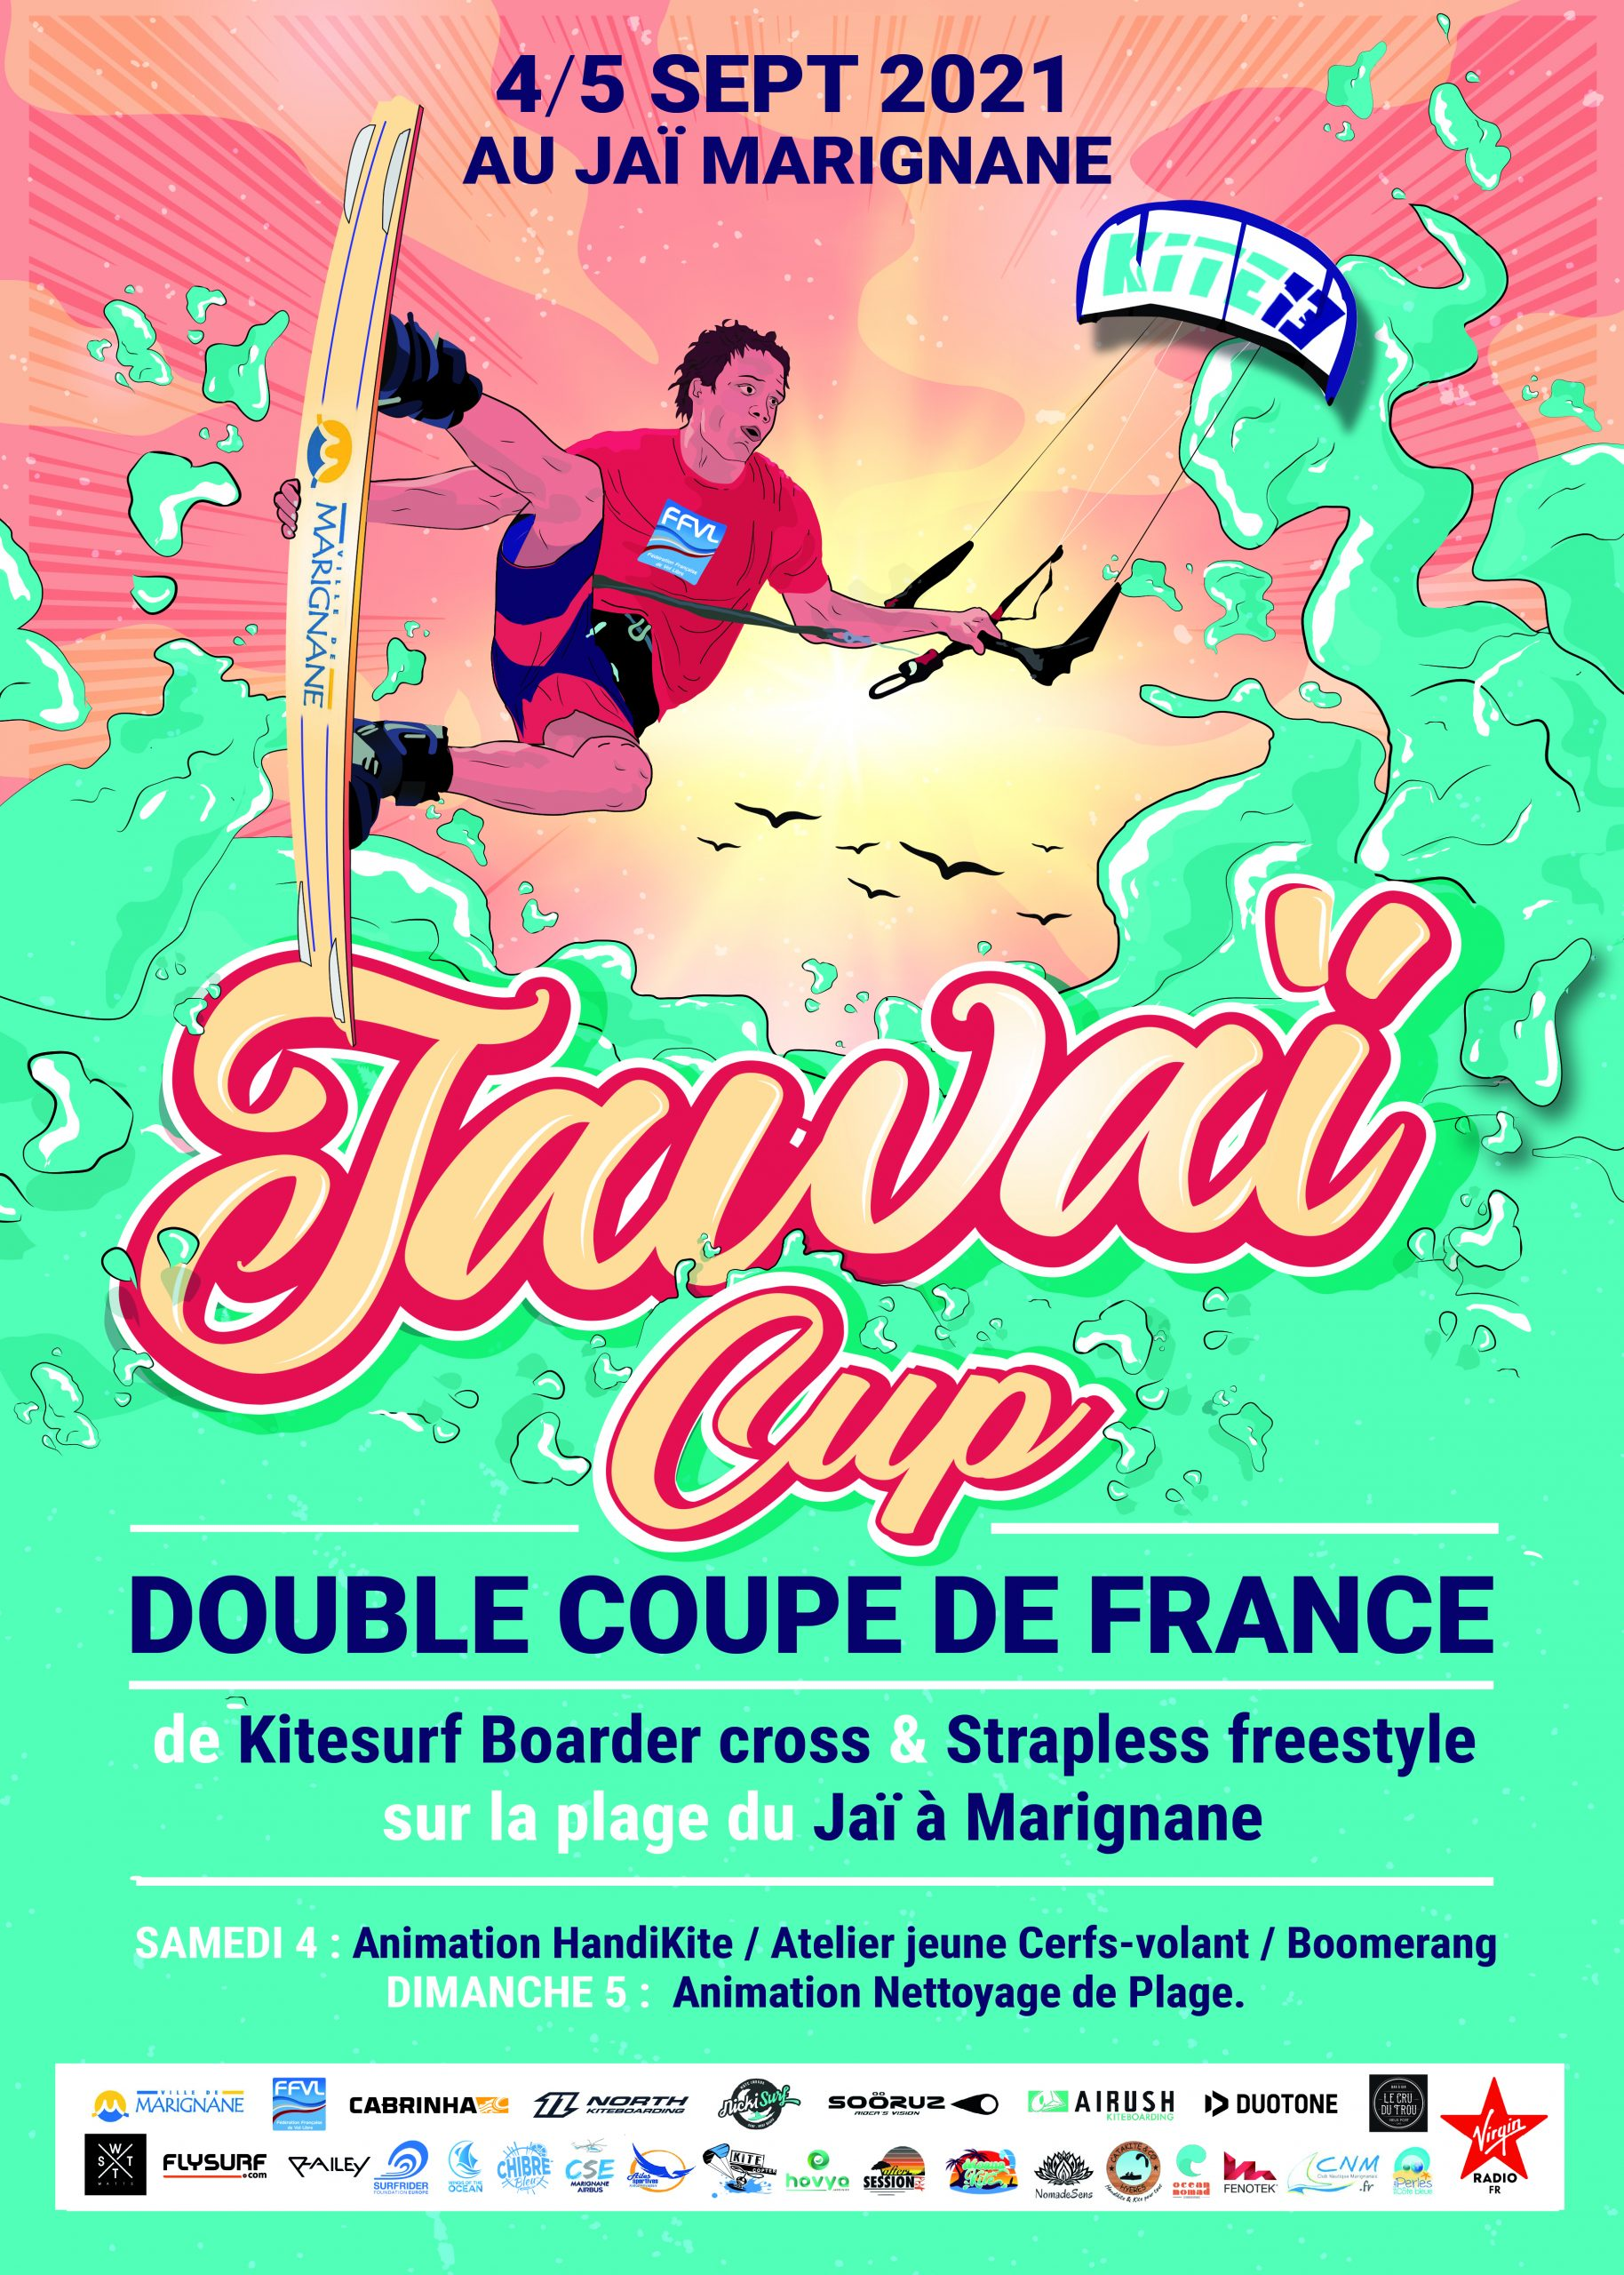 Jawai Cup Marignane